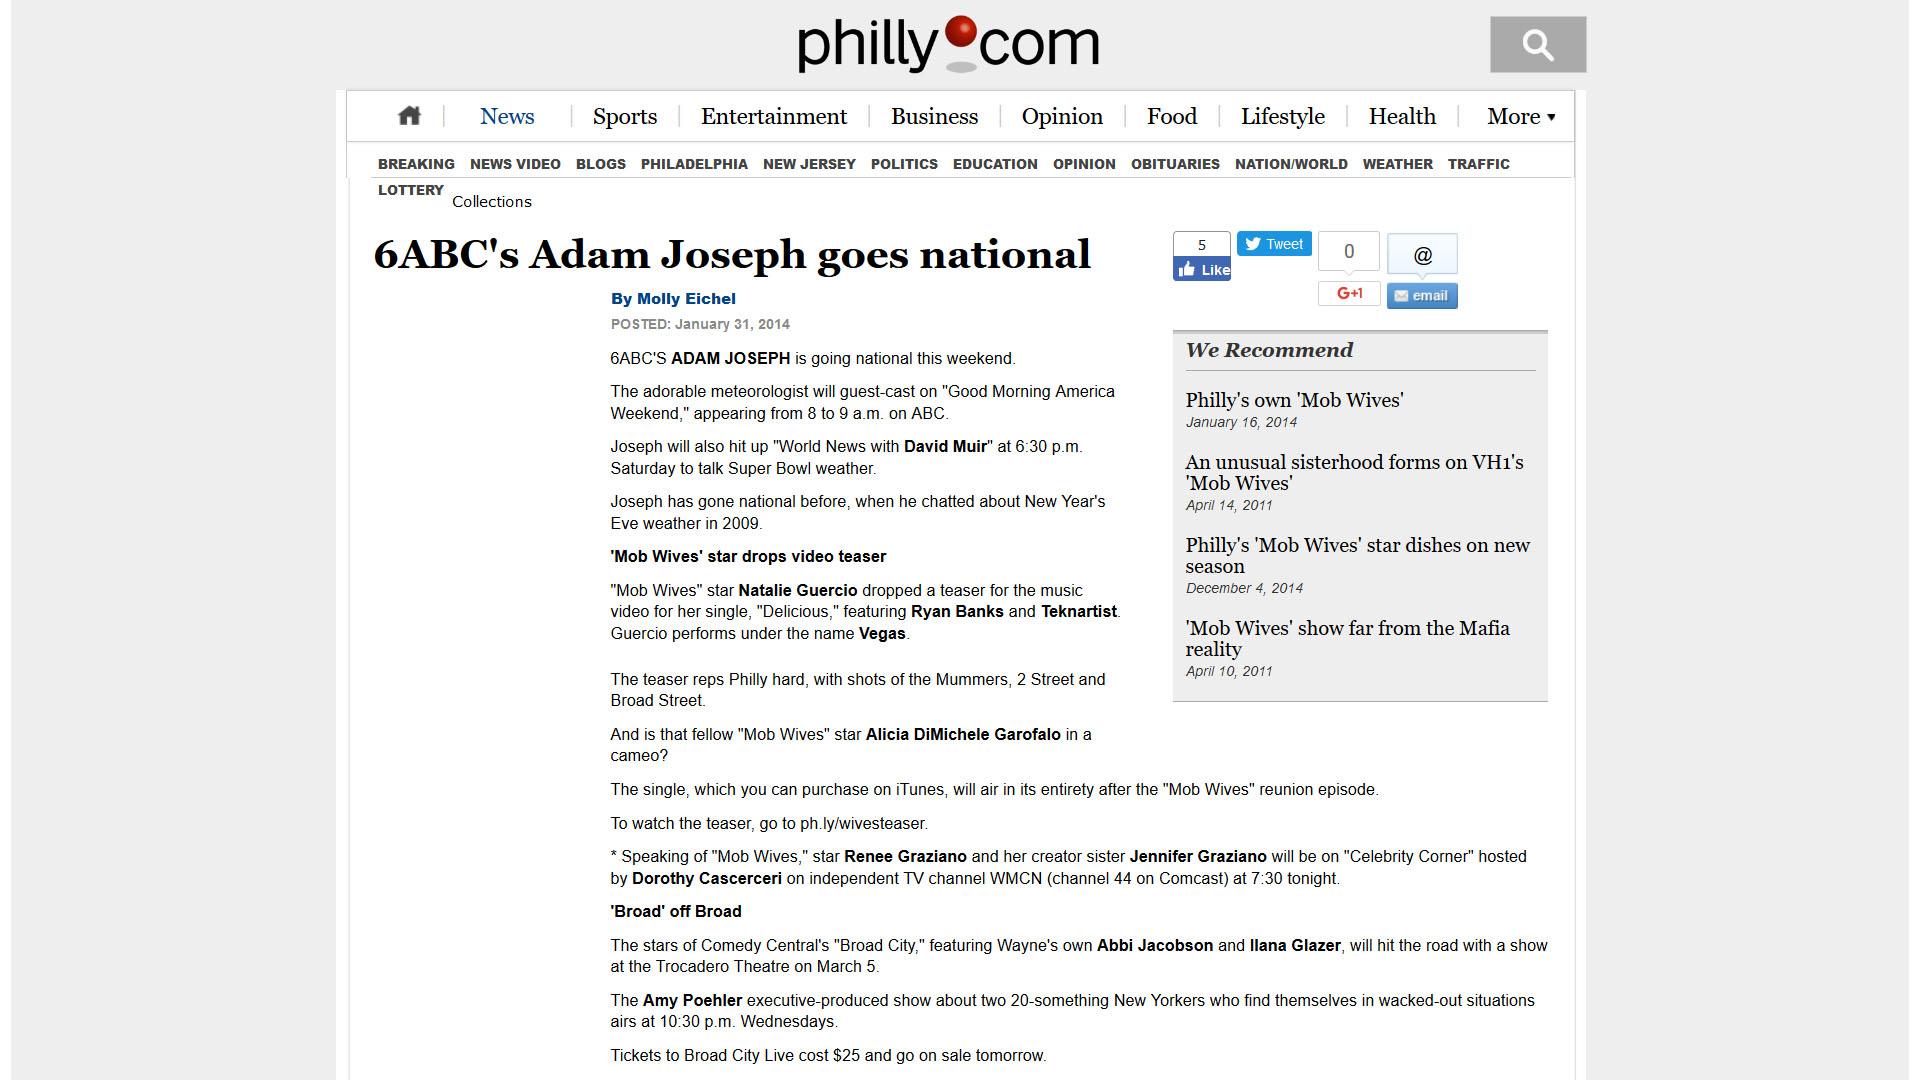 6ABC's Adam Joseph goes national